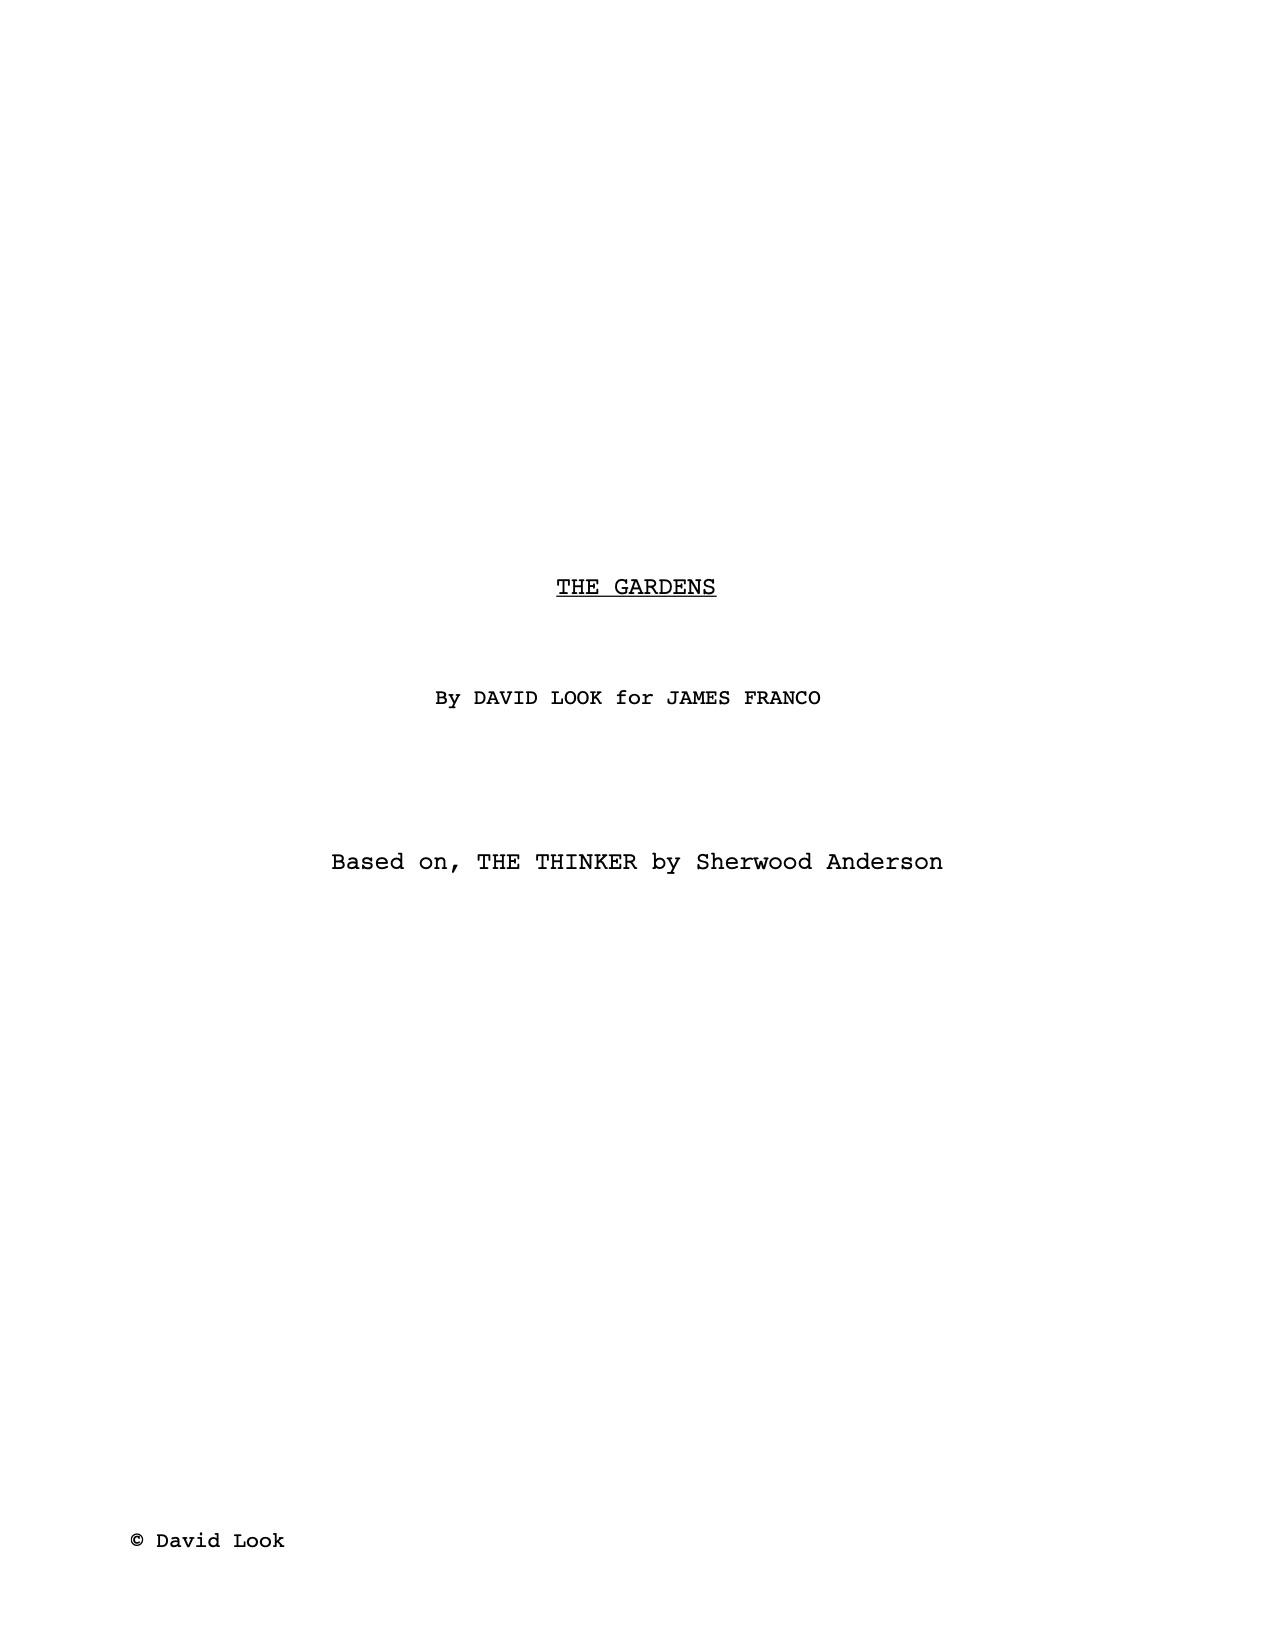 TitlePage-DavidLook-TheGardens